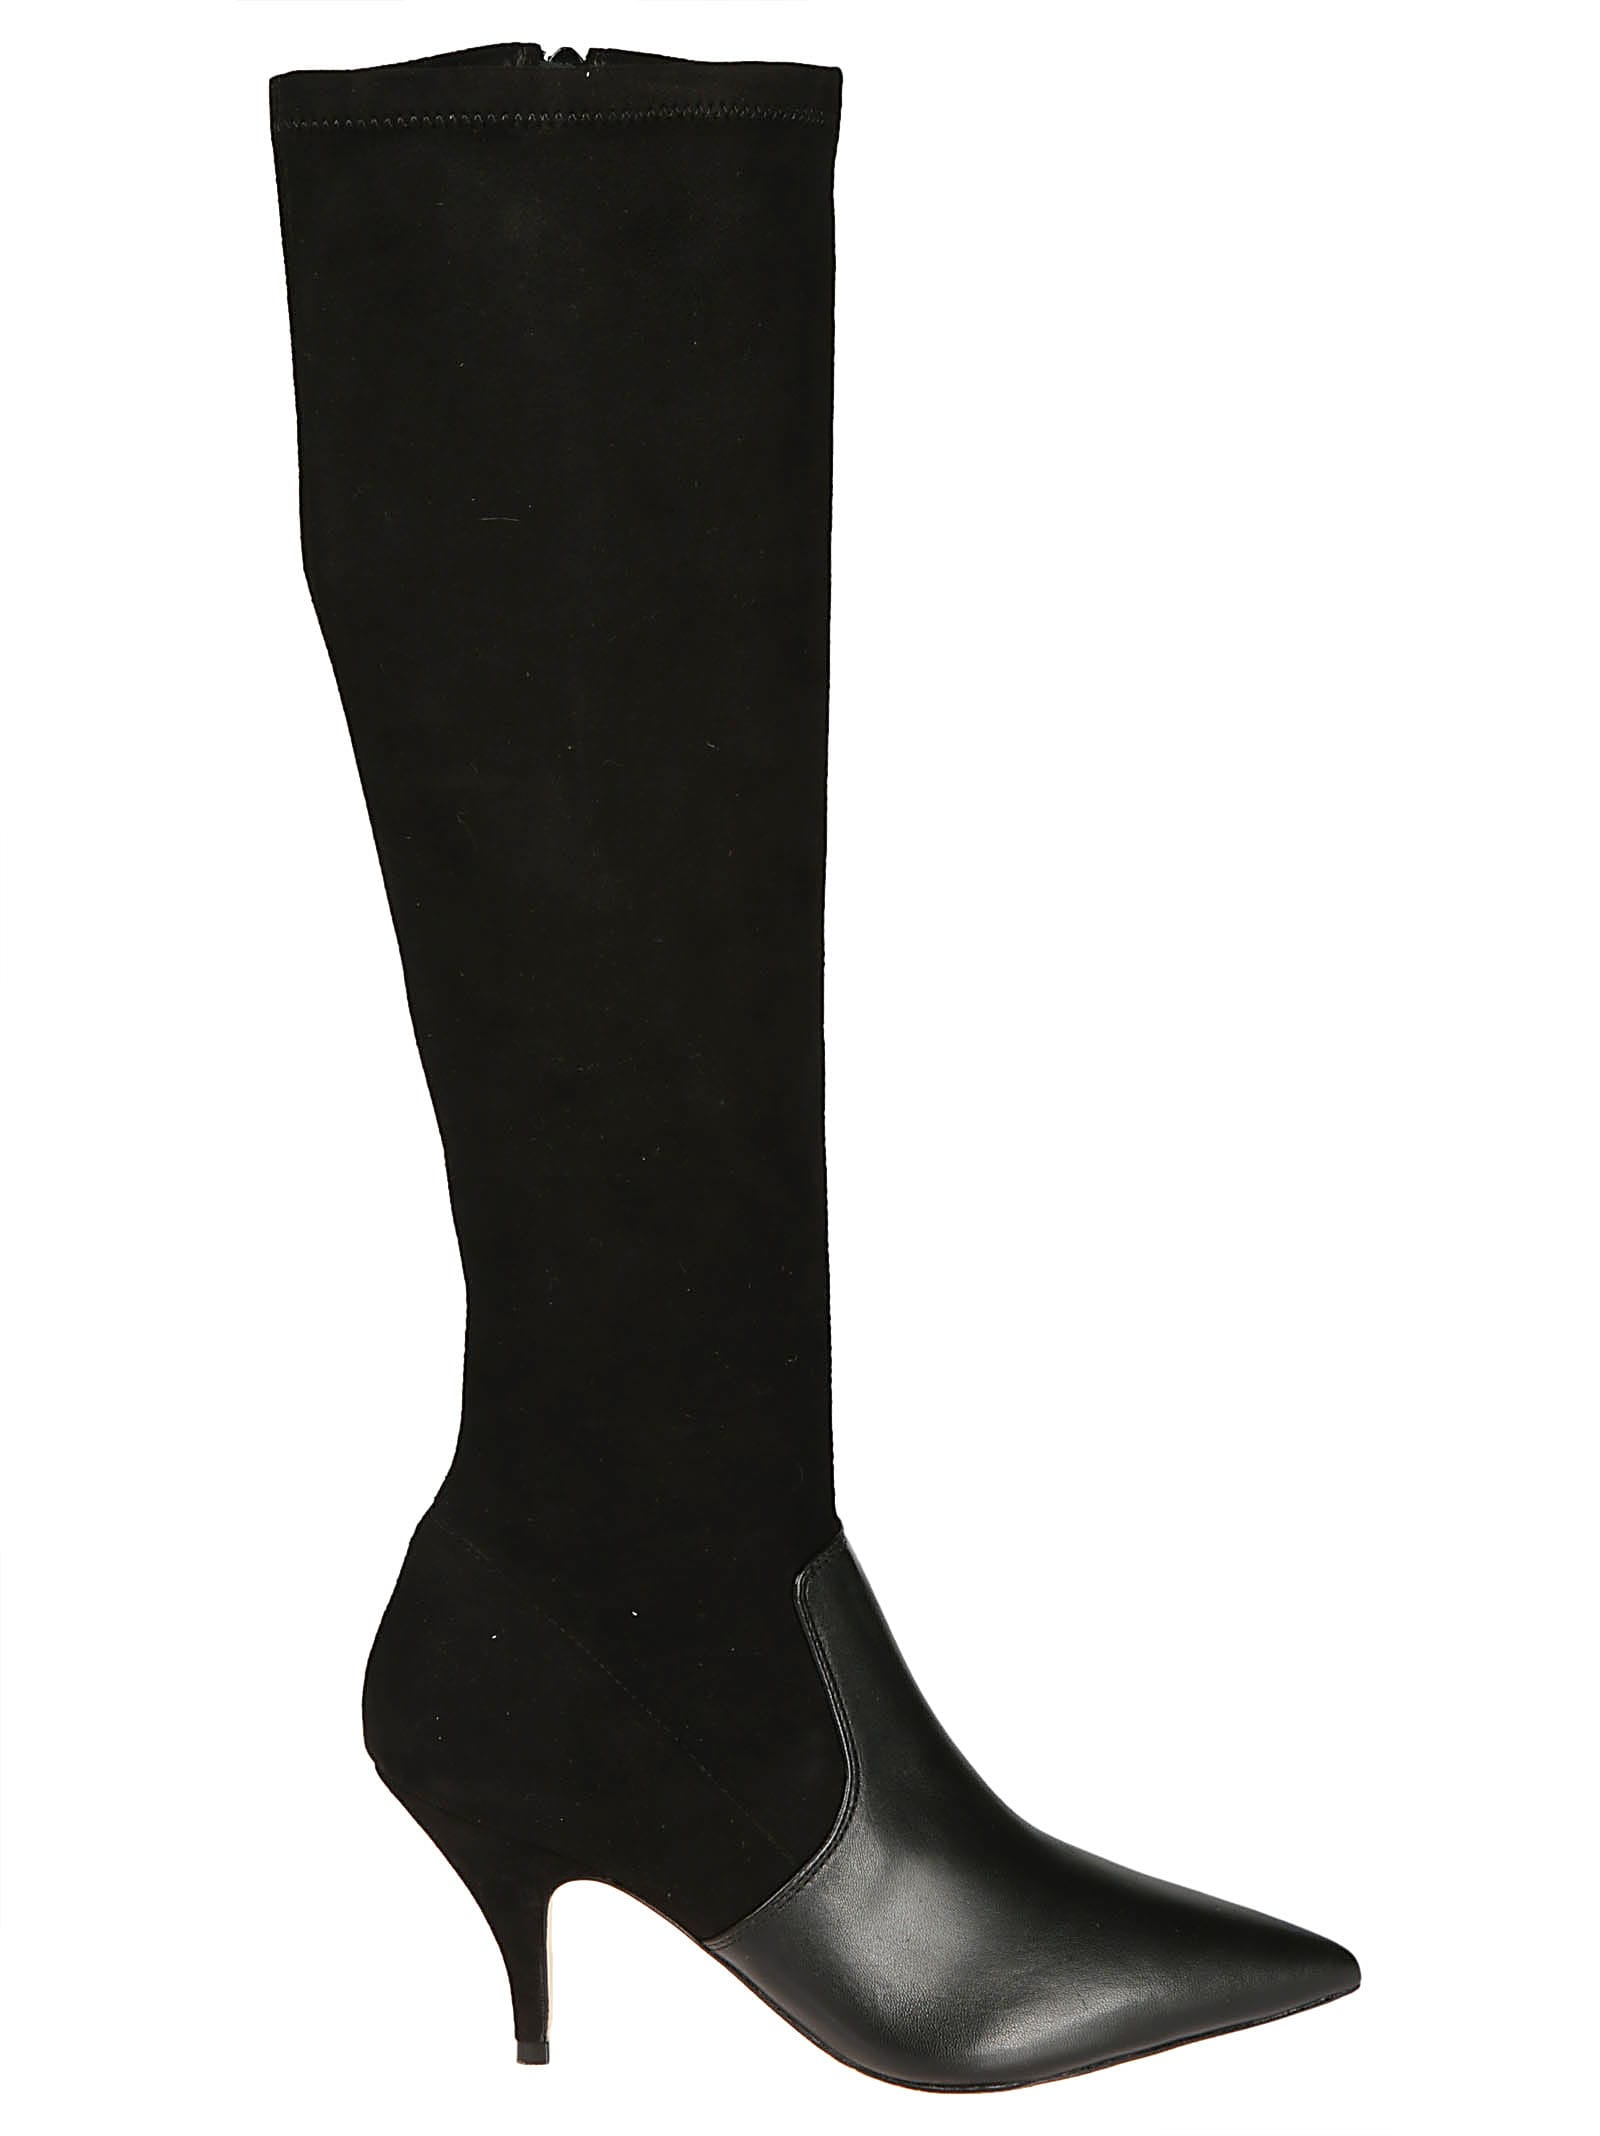 Tory Burch Paneled Boots